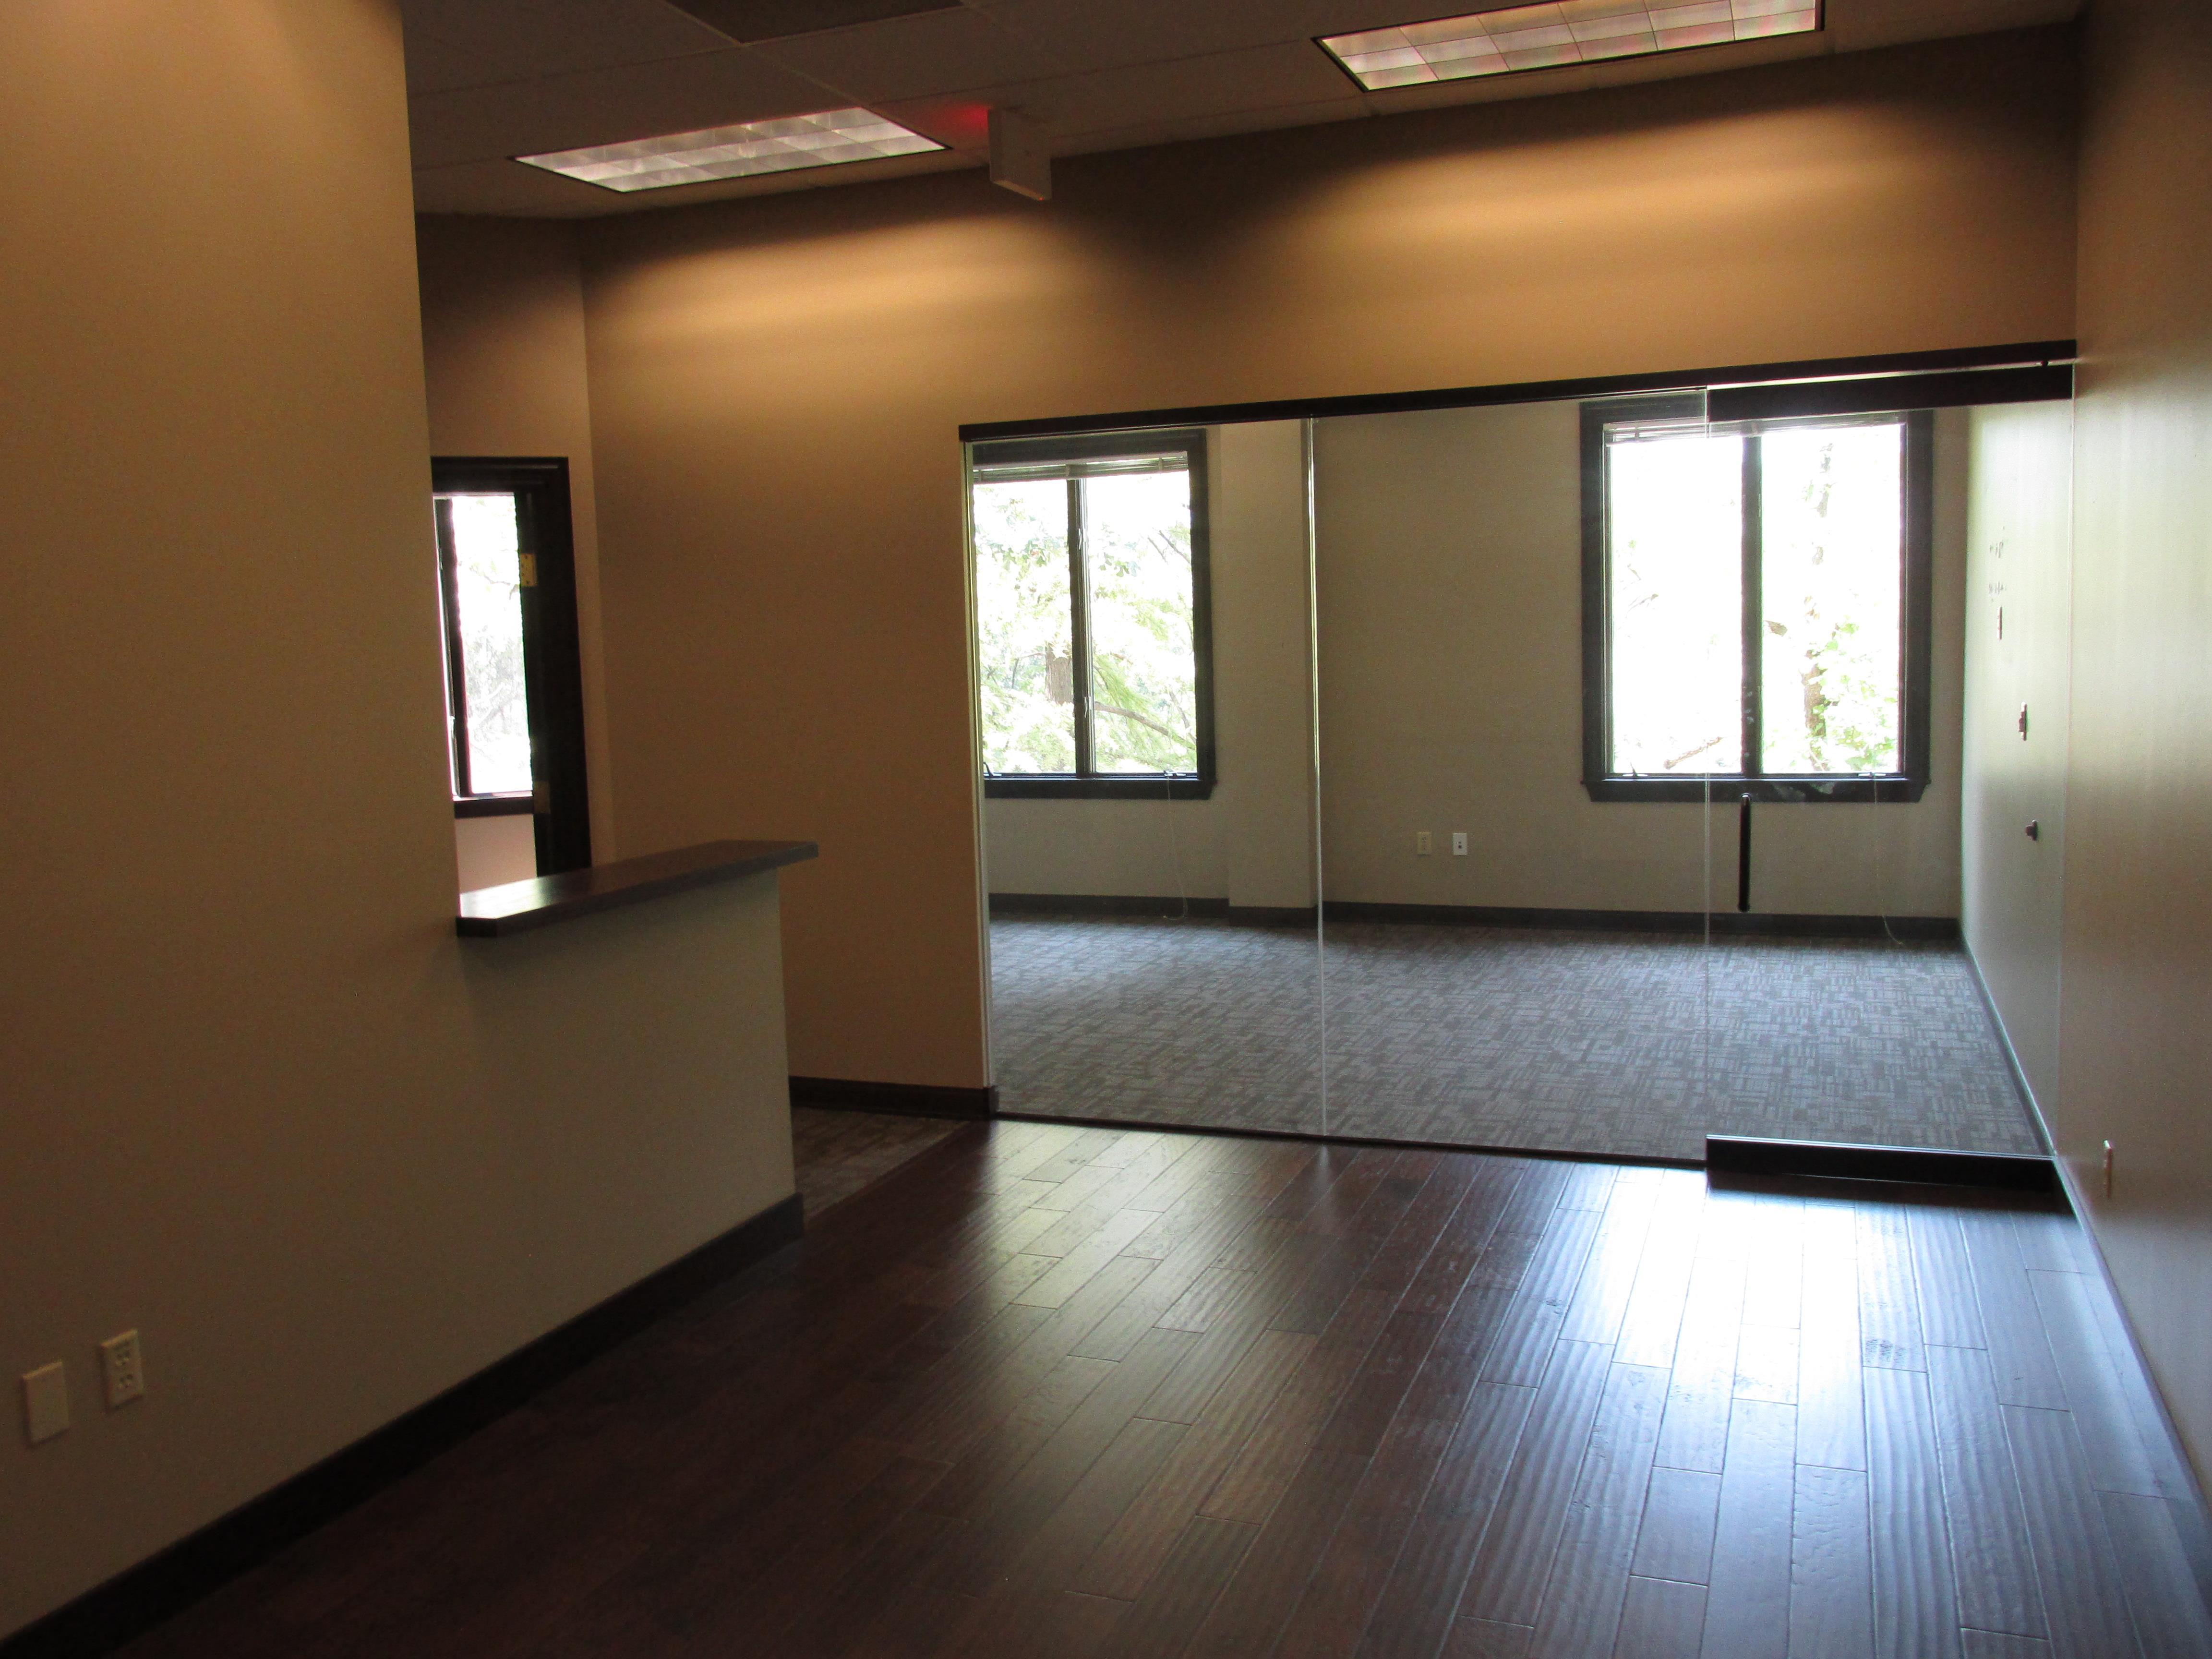 Granite   Cedar Maple Plaza I, II, & III - Cedar Maple Plaza II Suite 250